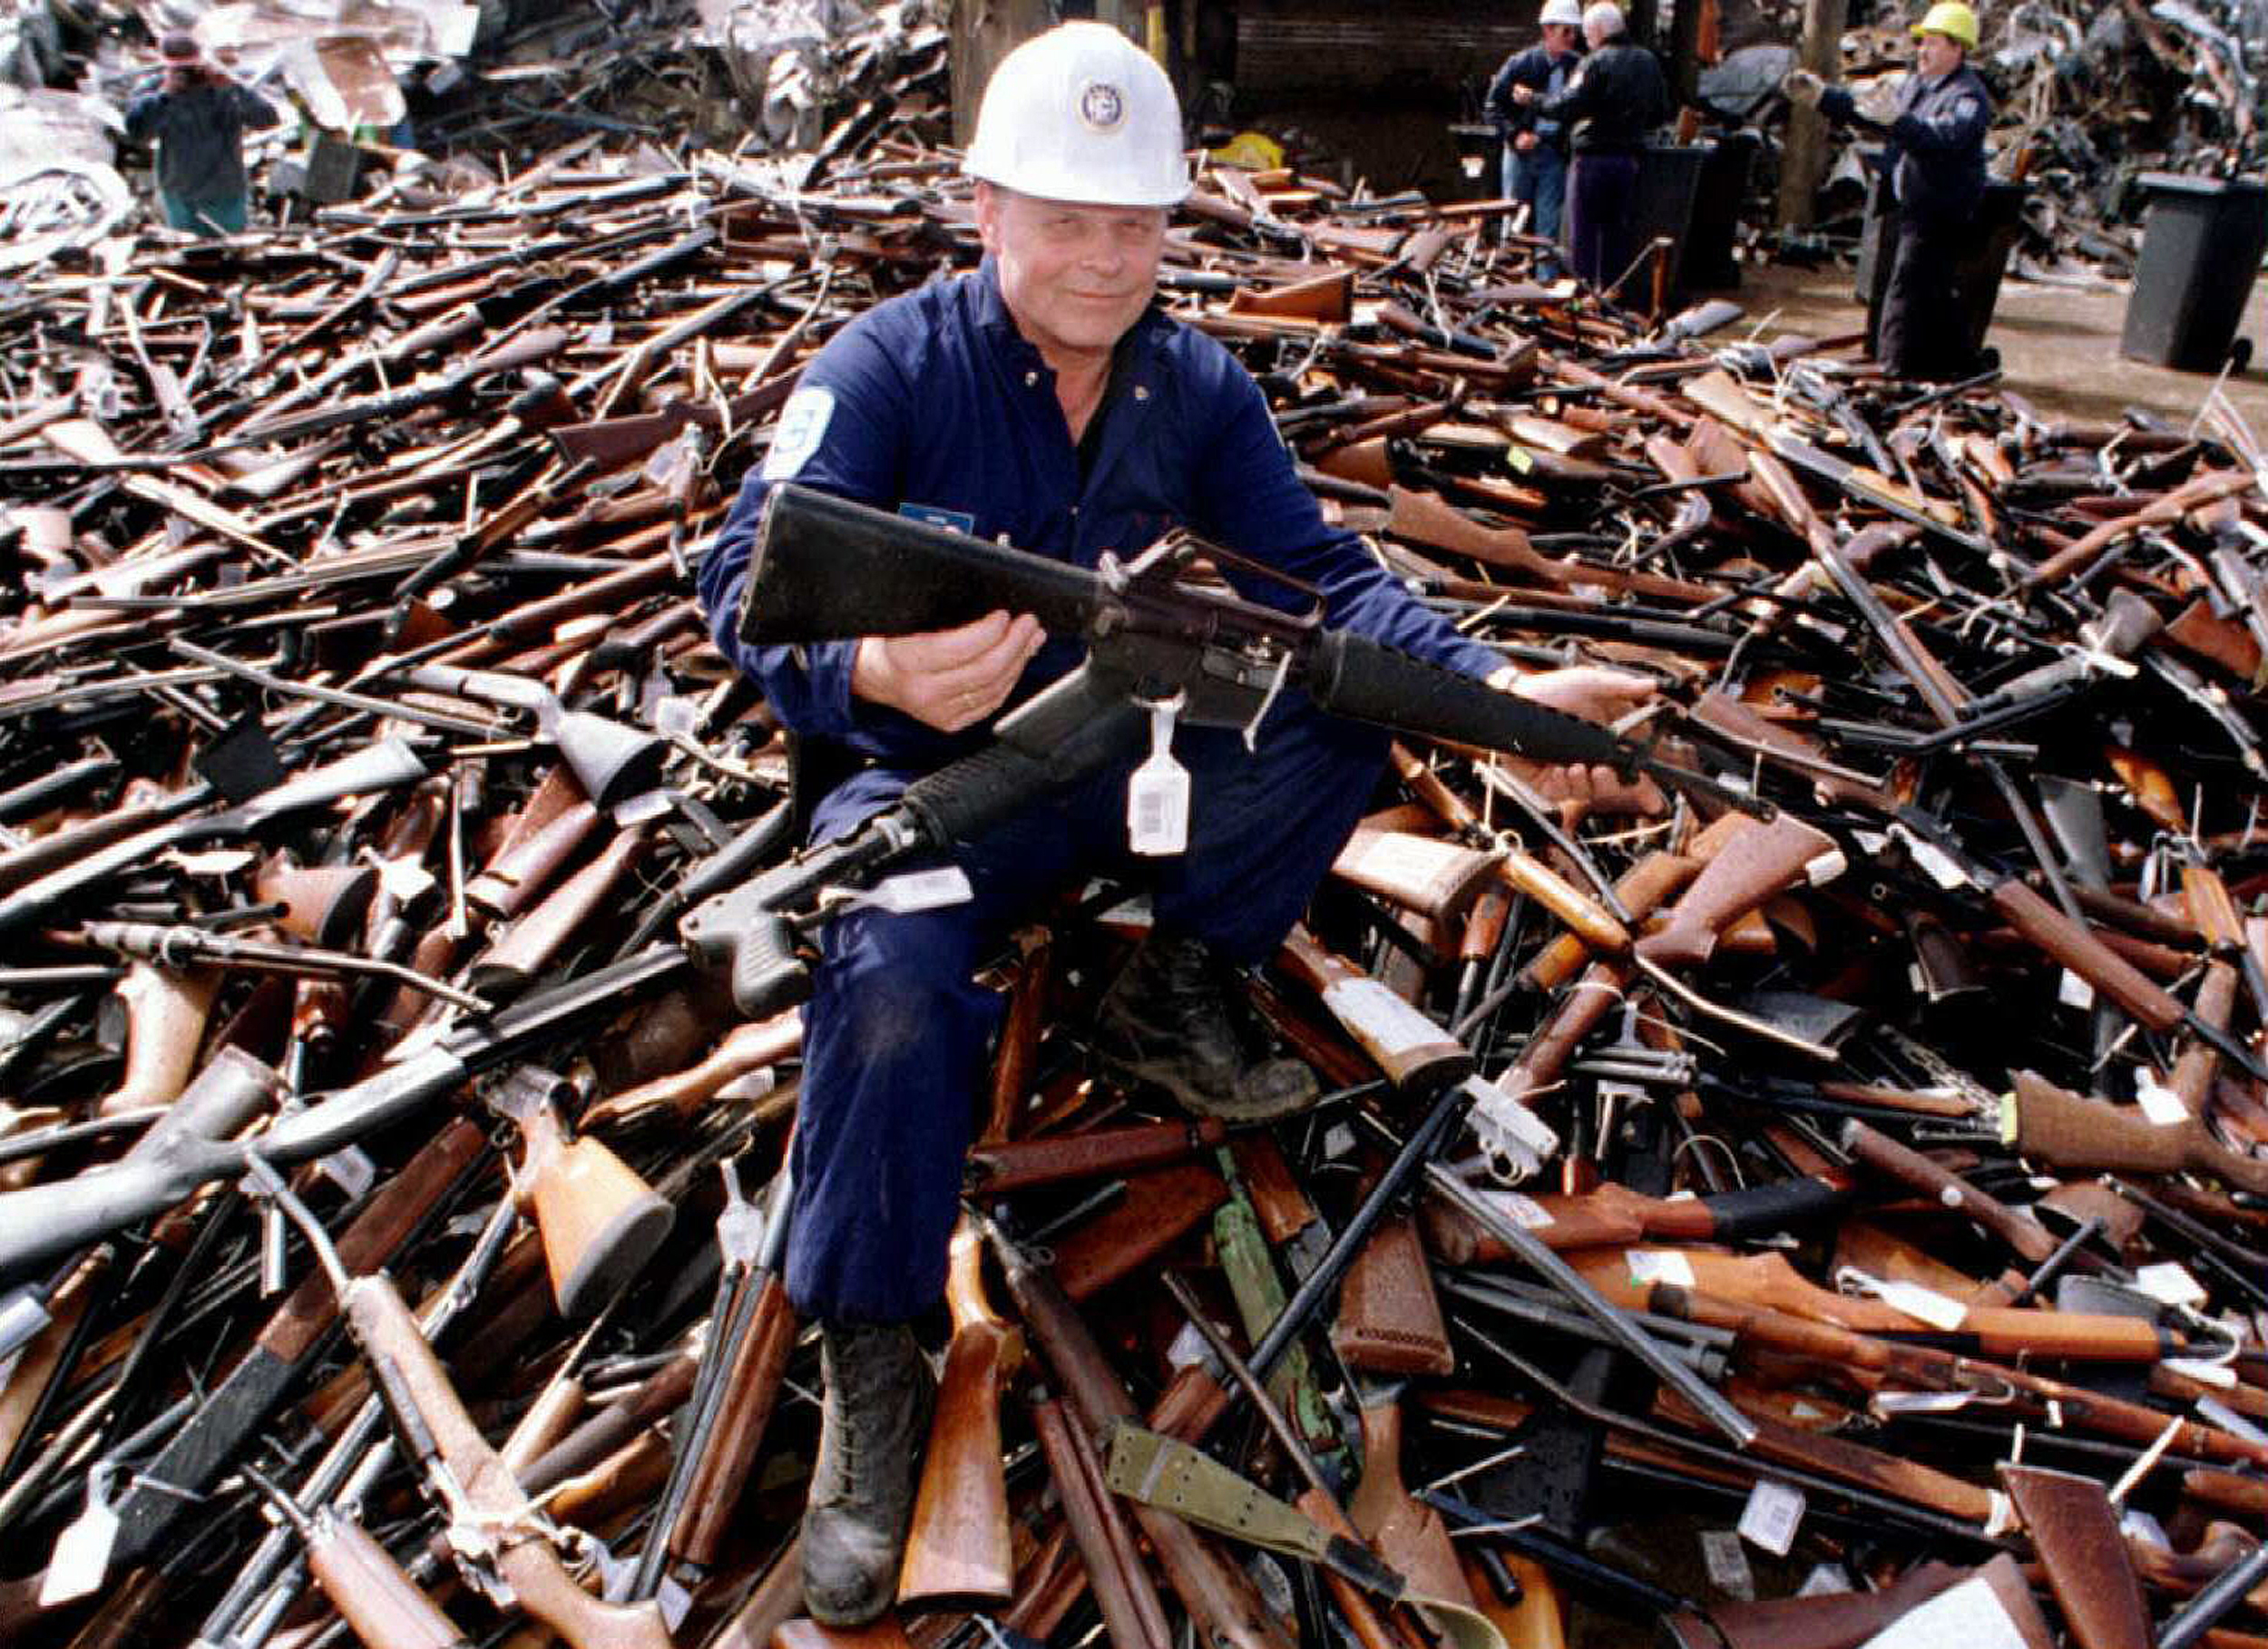 Australia's mass shooting is not proof gun control doesn't